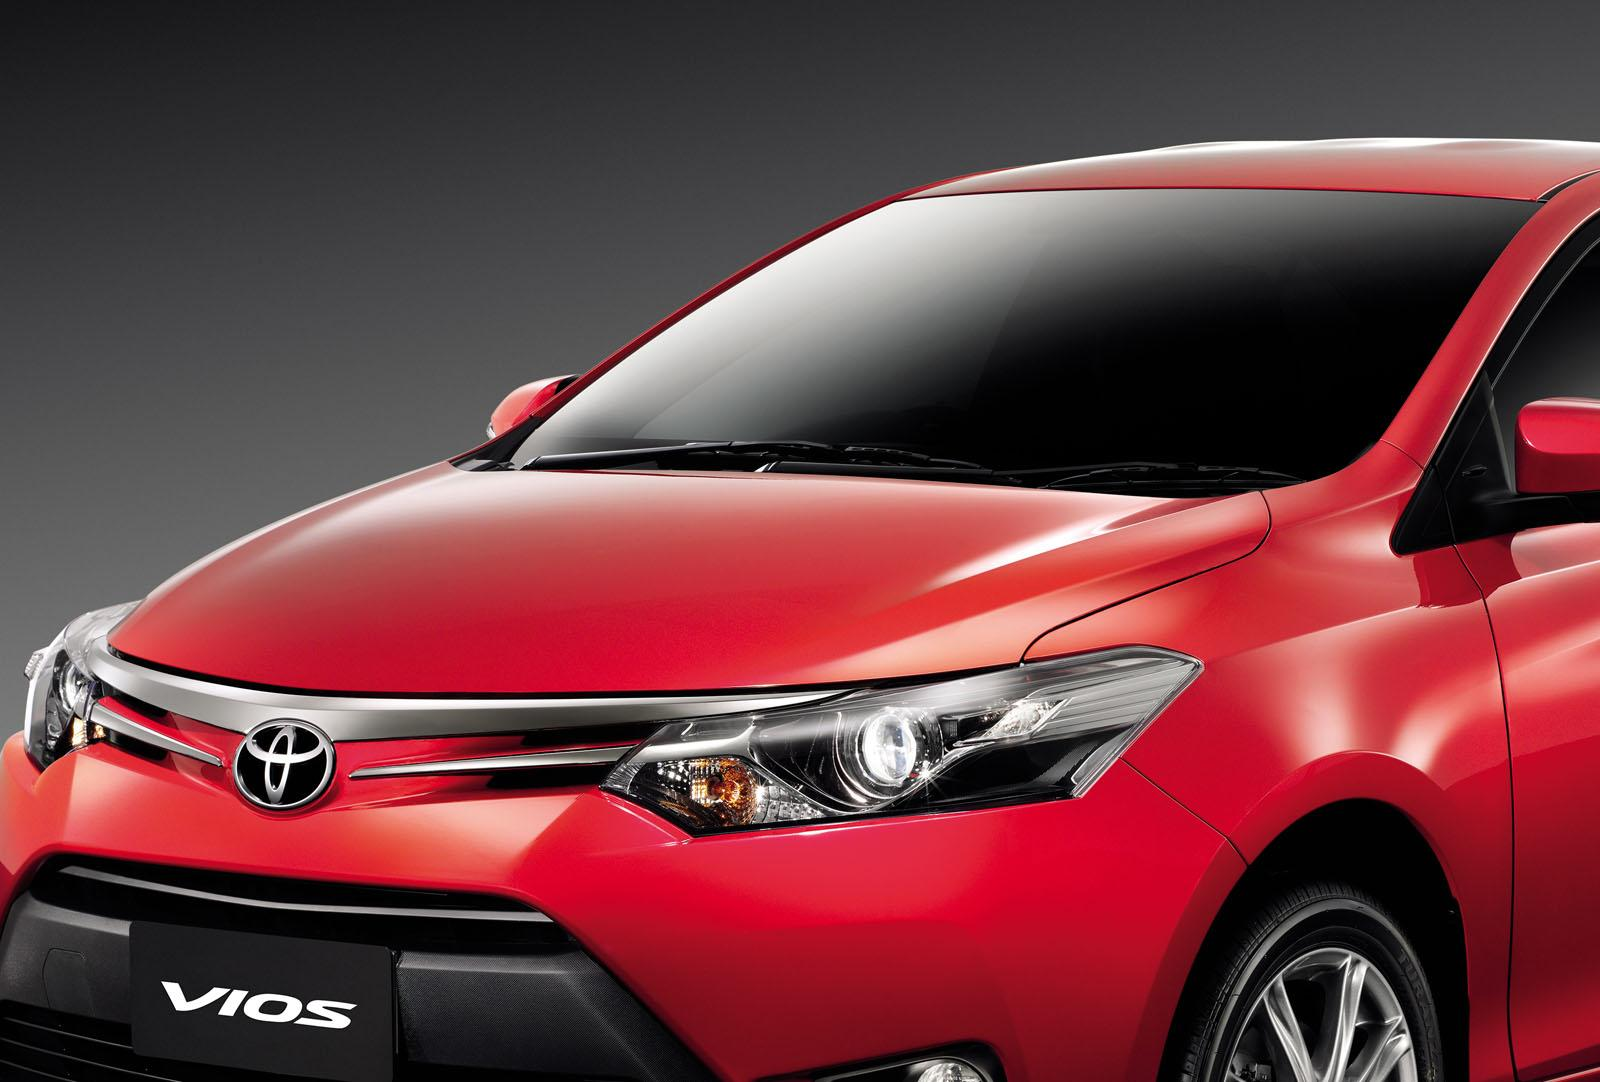 Toyota Vios 2014 - Autoblog.gr